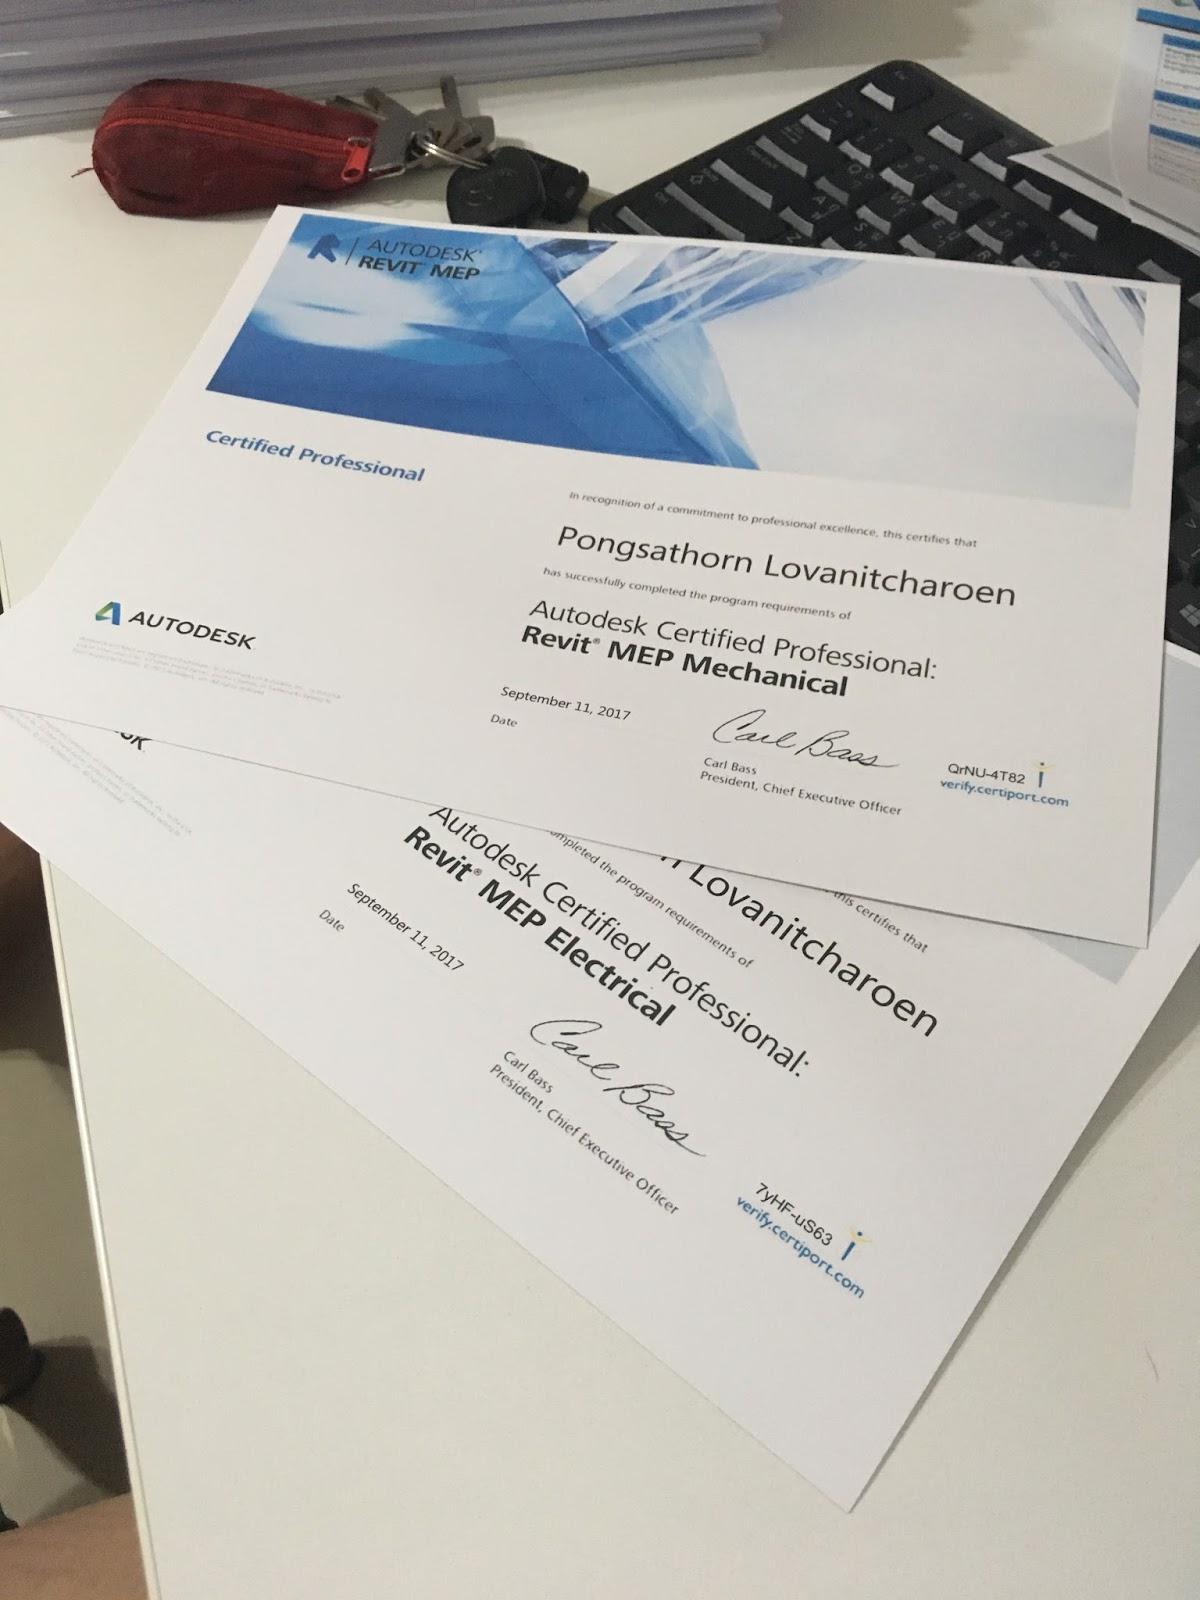 Bim underground revit certification electrical and mechanical certificate score 4 1betcityfo Choice Image